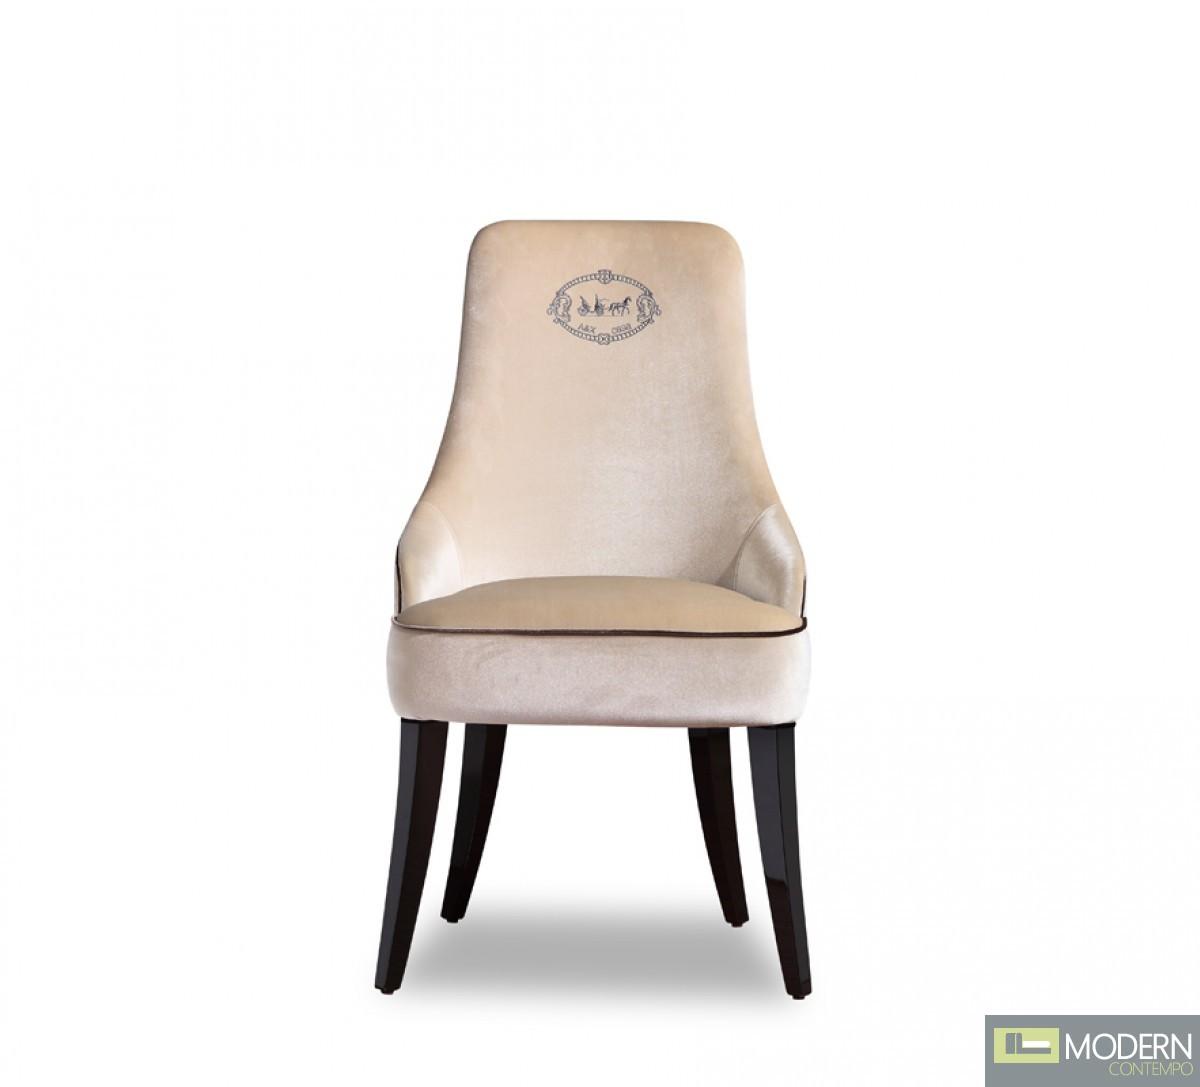 A Amp X Thalia Modern Off White Velour Dining Chair